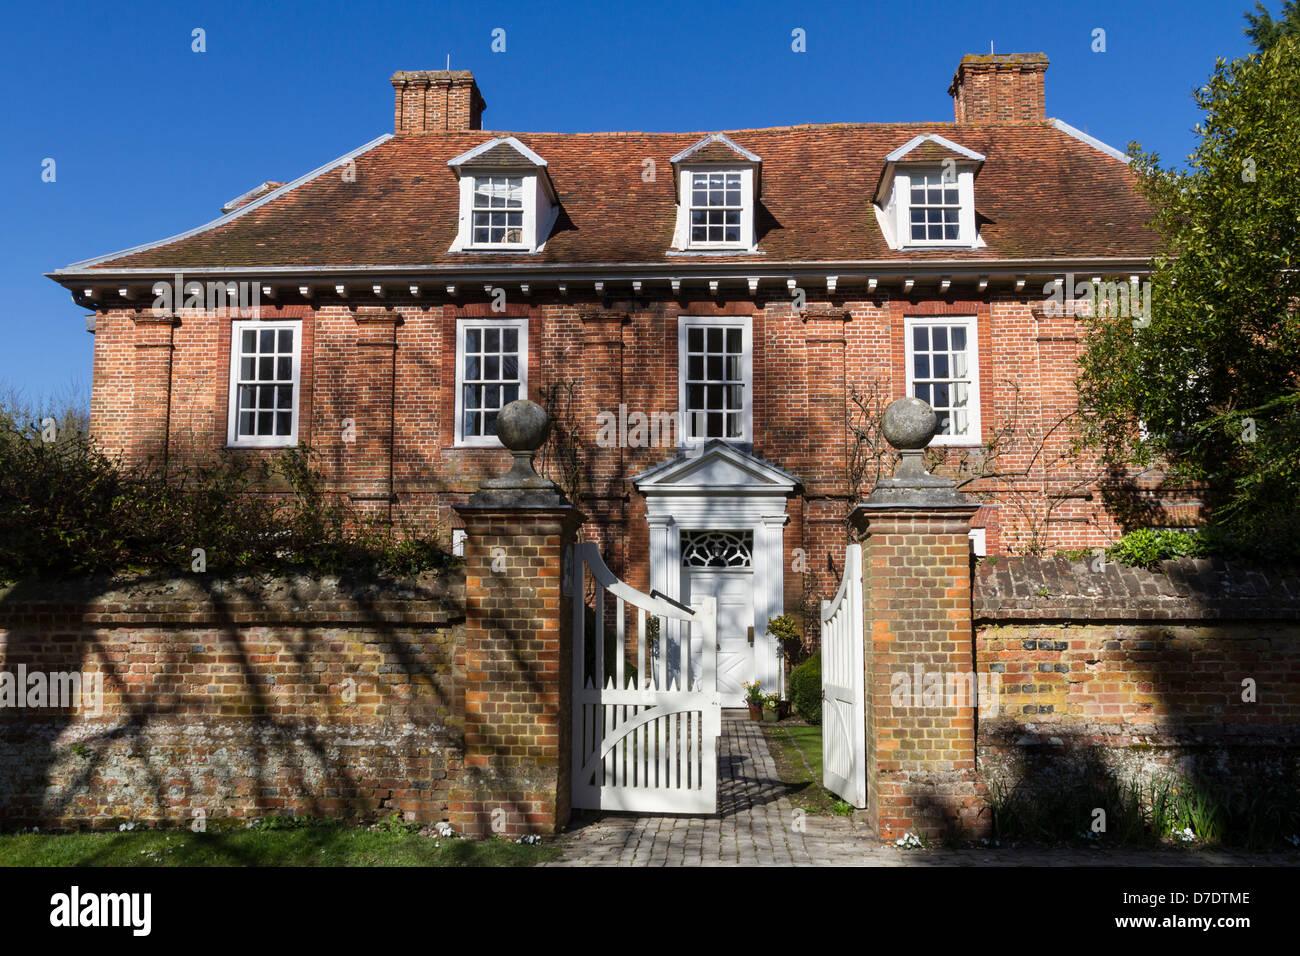 England Buckinghamshire Princes Risborough Manor house - Stock Image